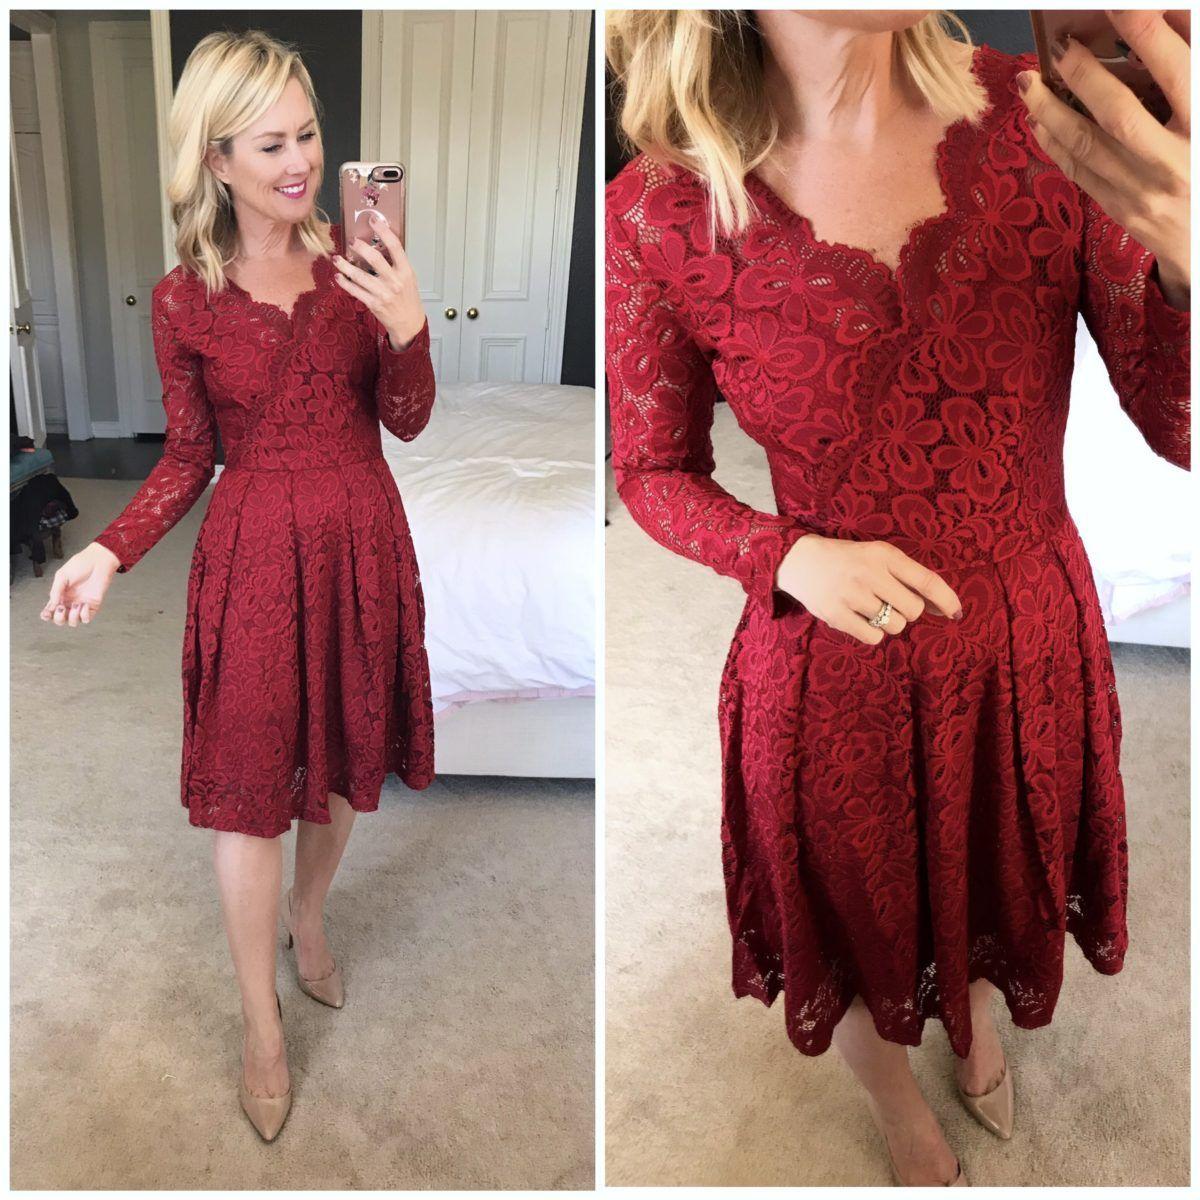 Amazon Fashion Finds November Hi Sugarplum November Wedding Guest Outfits Wedding Guest Outfit Winter Wedding Guest Outfit [ 1200 x 1200 Pixel ]